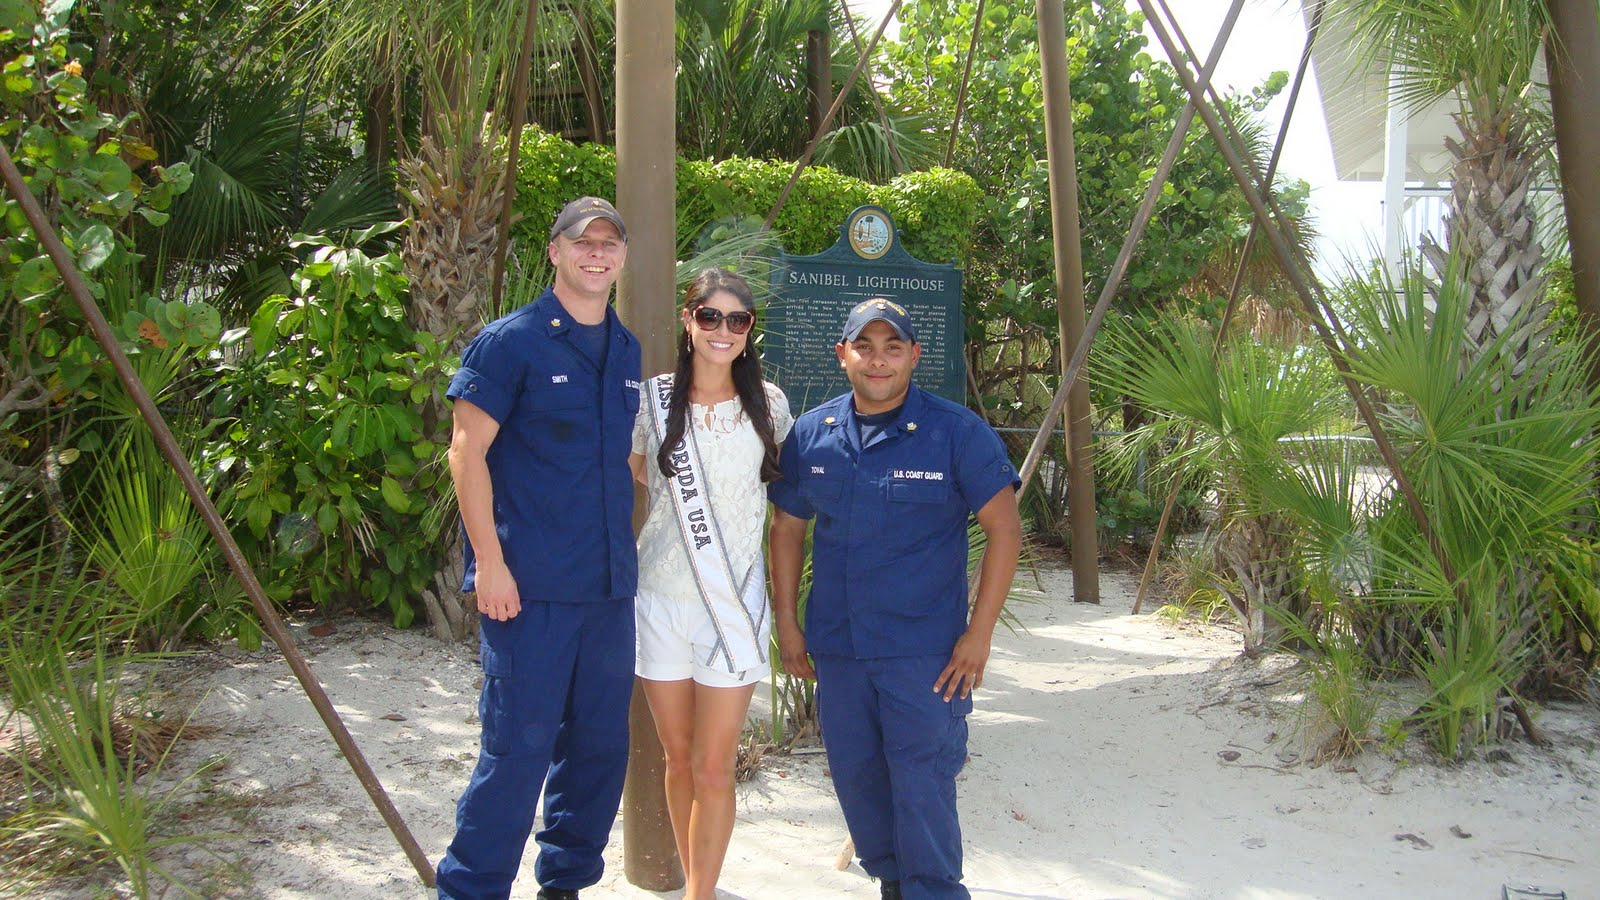 Miss Florida USA 2010 - Megan Clementi DSC01921